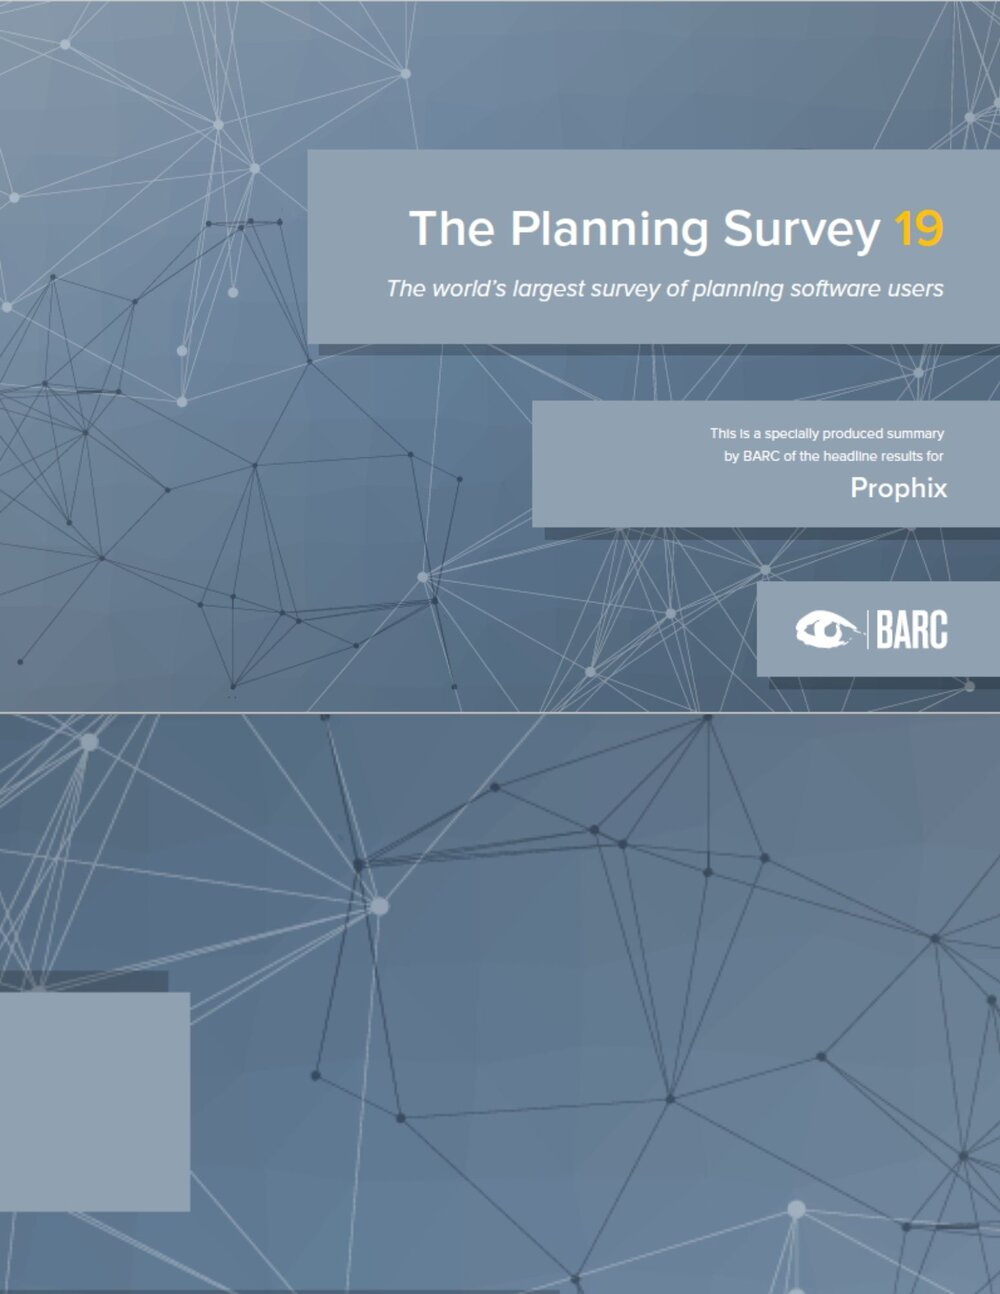 The Planning Survey 19